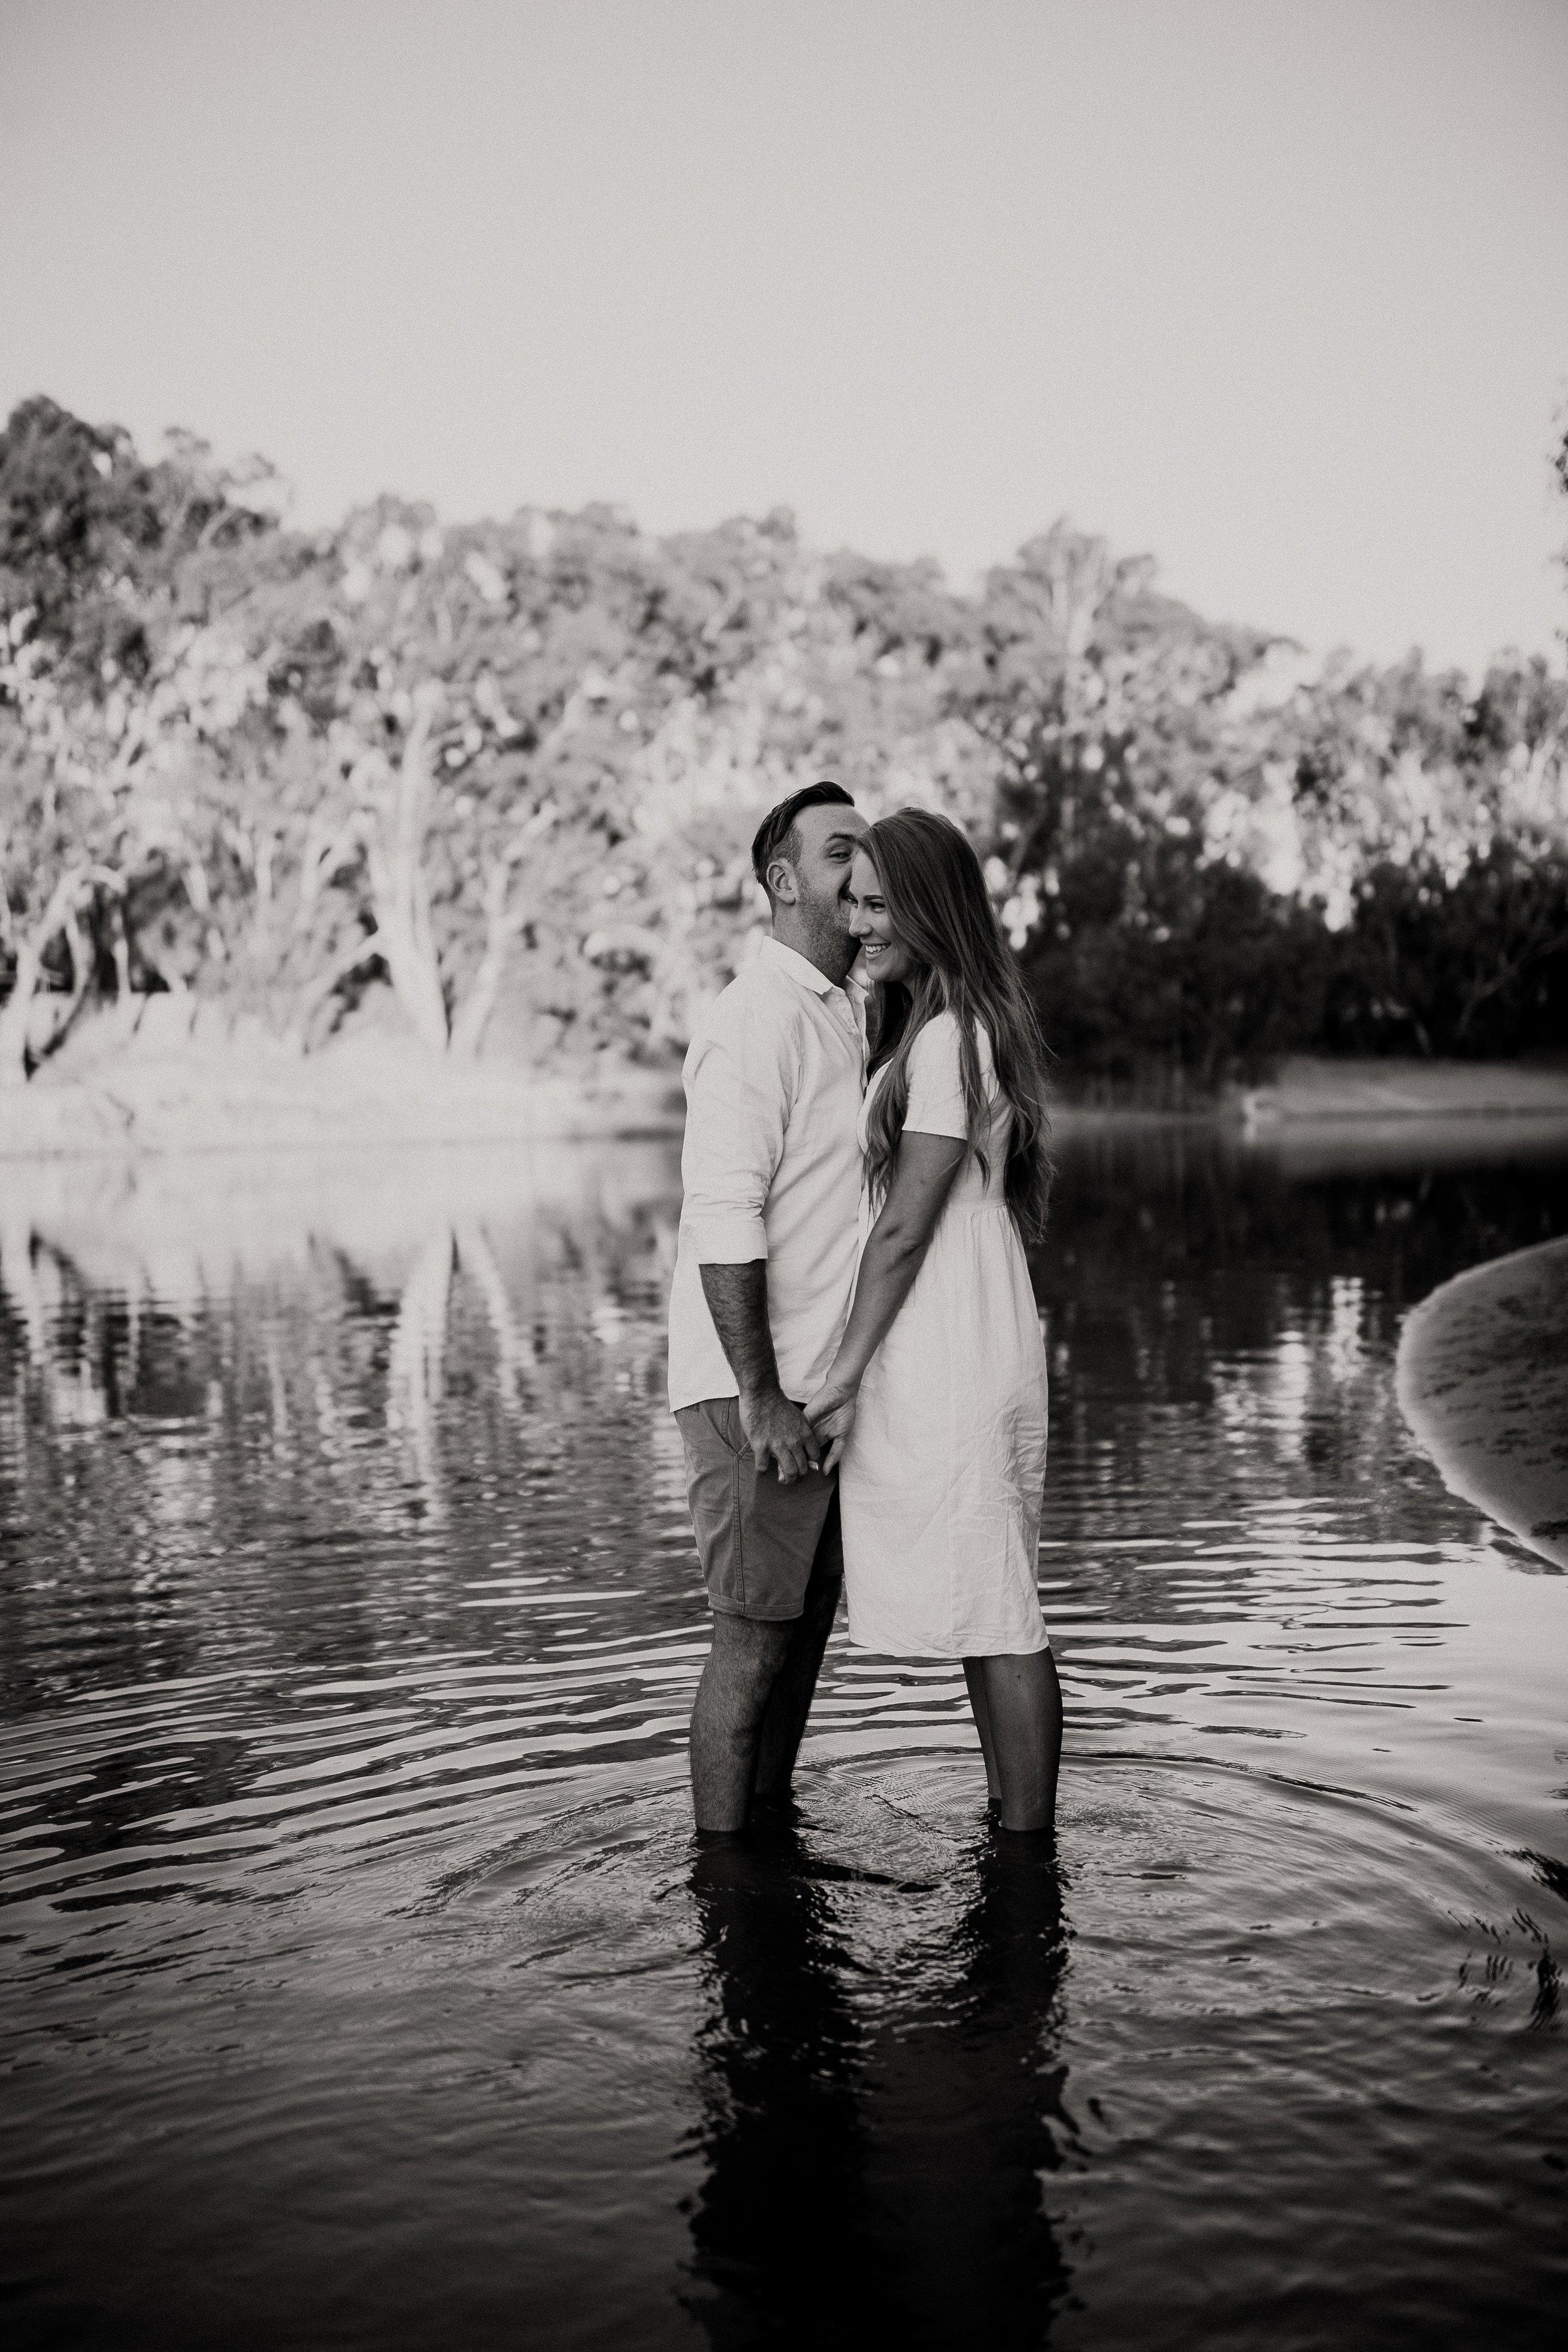 mickalathomas_puremacphotography_weddingphotographer_couplephotographer_Sheppartonphotographer_2829.jpg